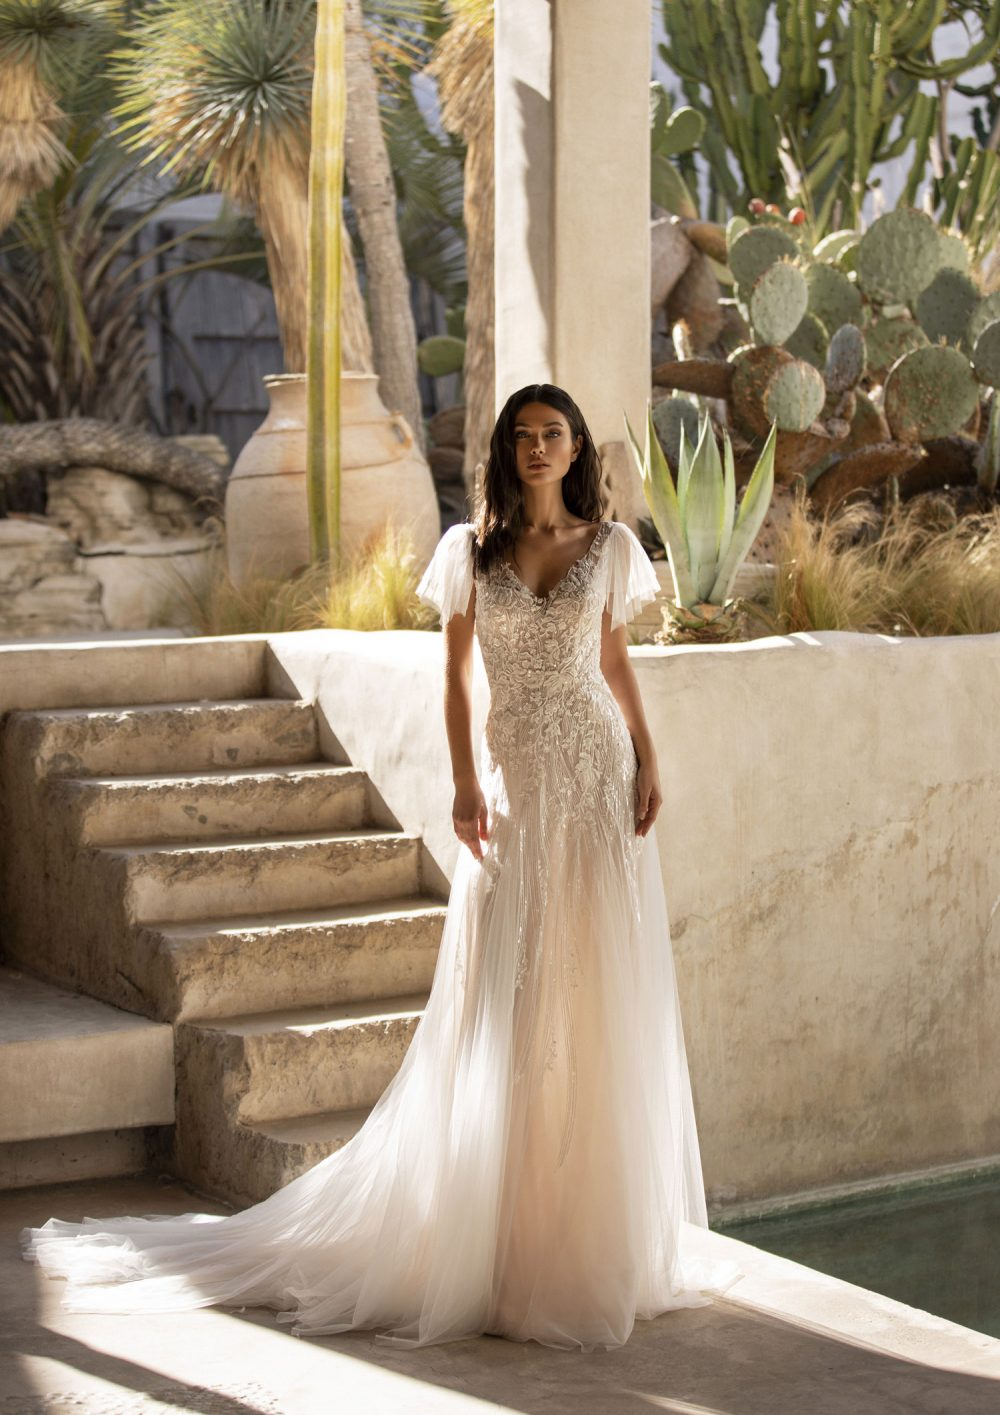 Mariages: abito da sposa Pronovias 2021 a Vicenza, Verona, Padova, Veneto LAKE